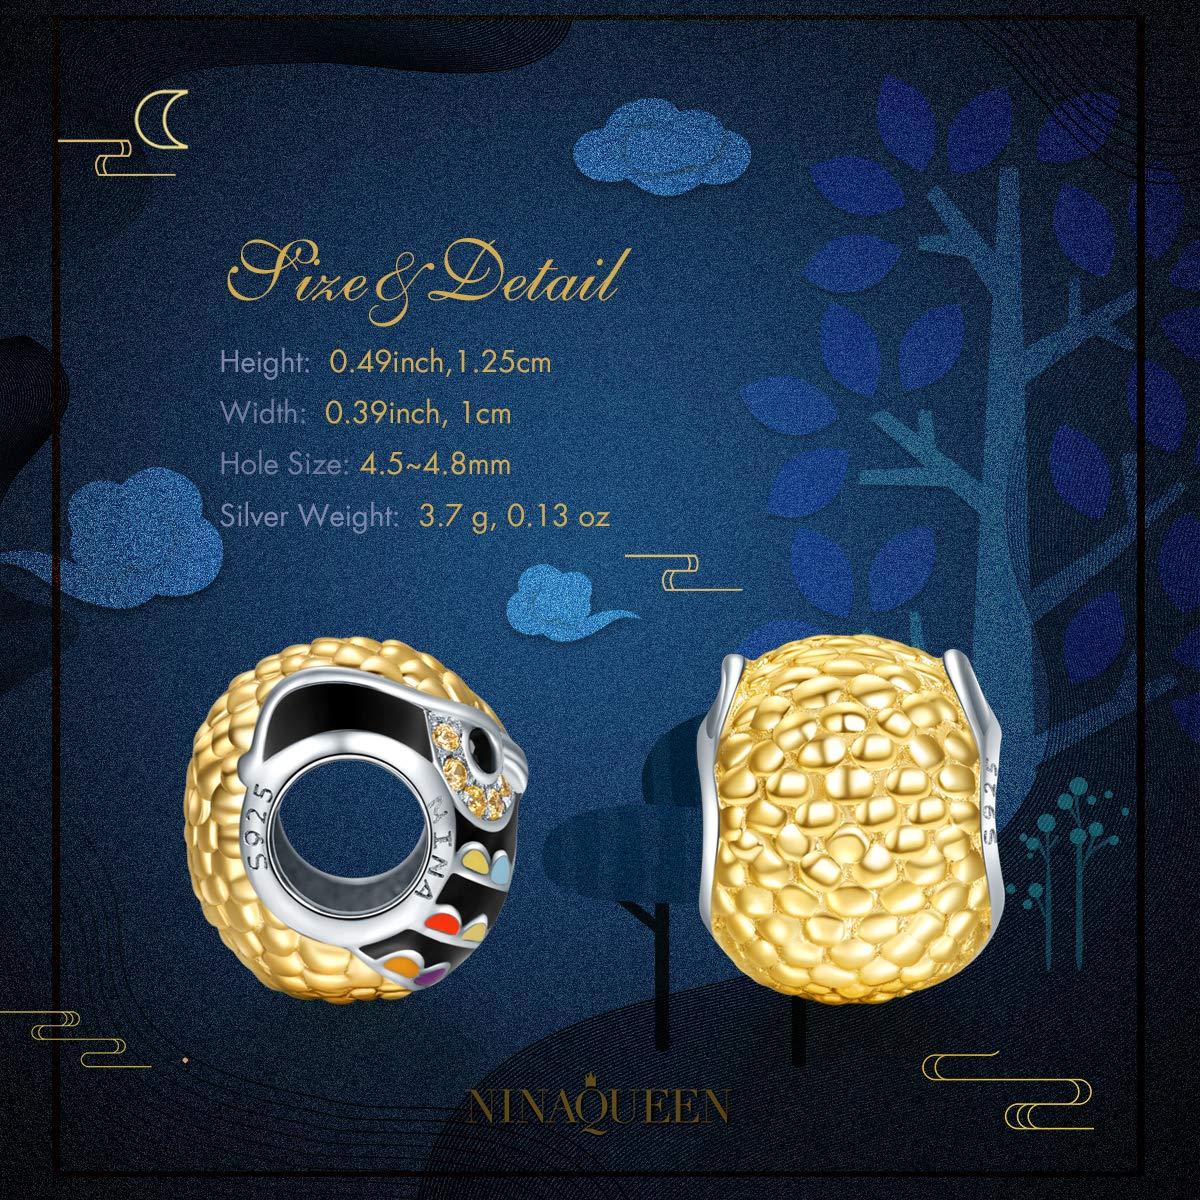 2a4839232fad NINAQUEEN Abalorios Charms para Mujer Búhos Plata 925 Chapado en Oro para  Amantes ...